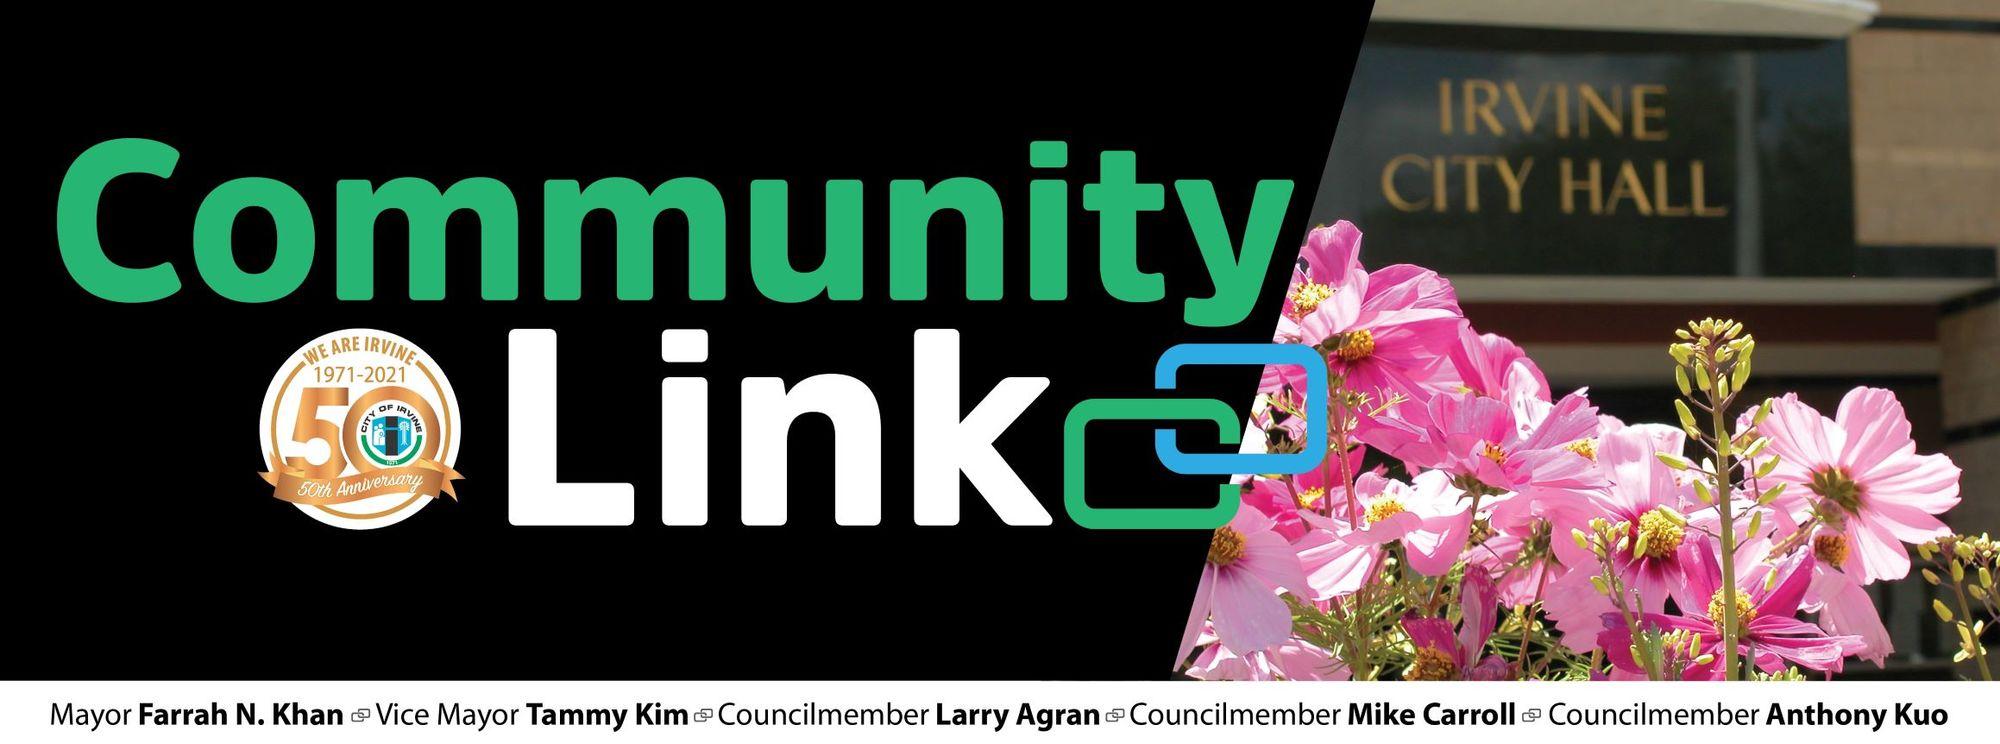 Community Link